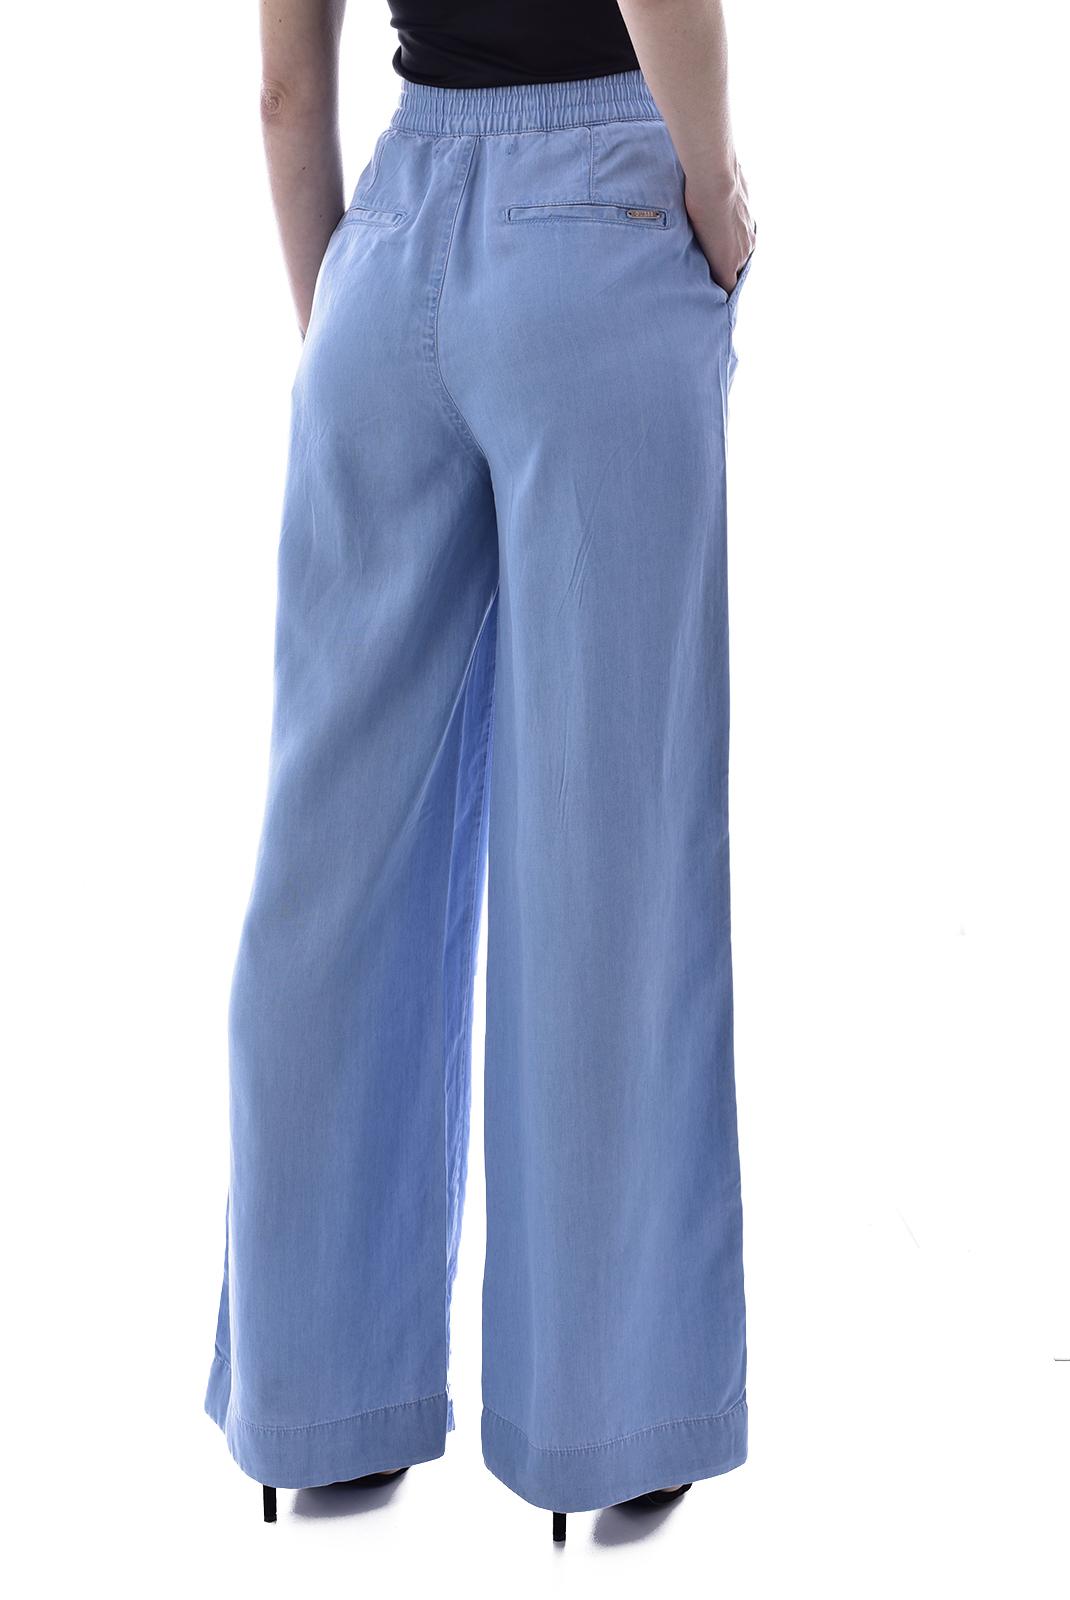 Pantalons  Guess jeans W02A32 D3ZW2 IRINA WLILWATER LILY